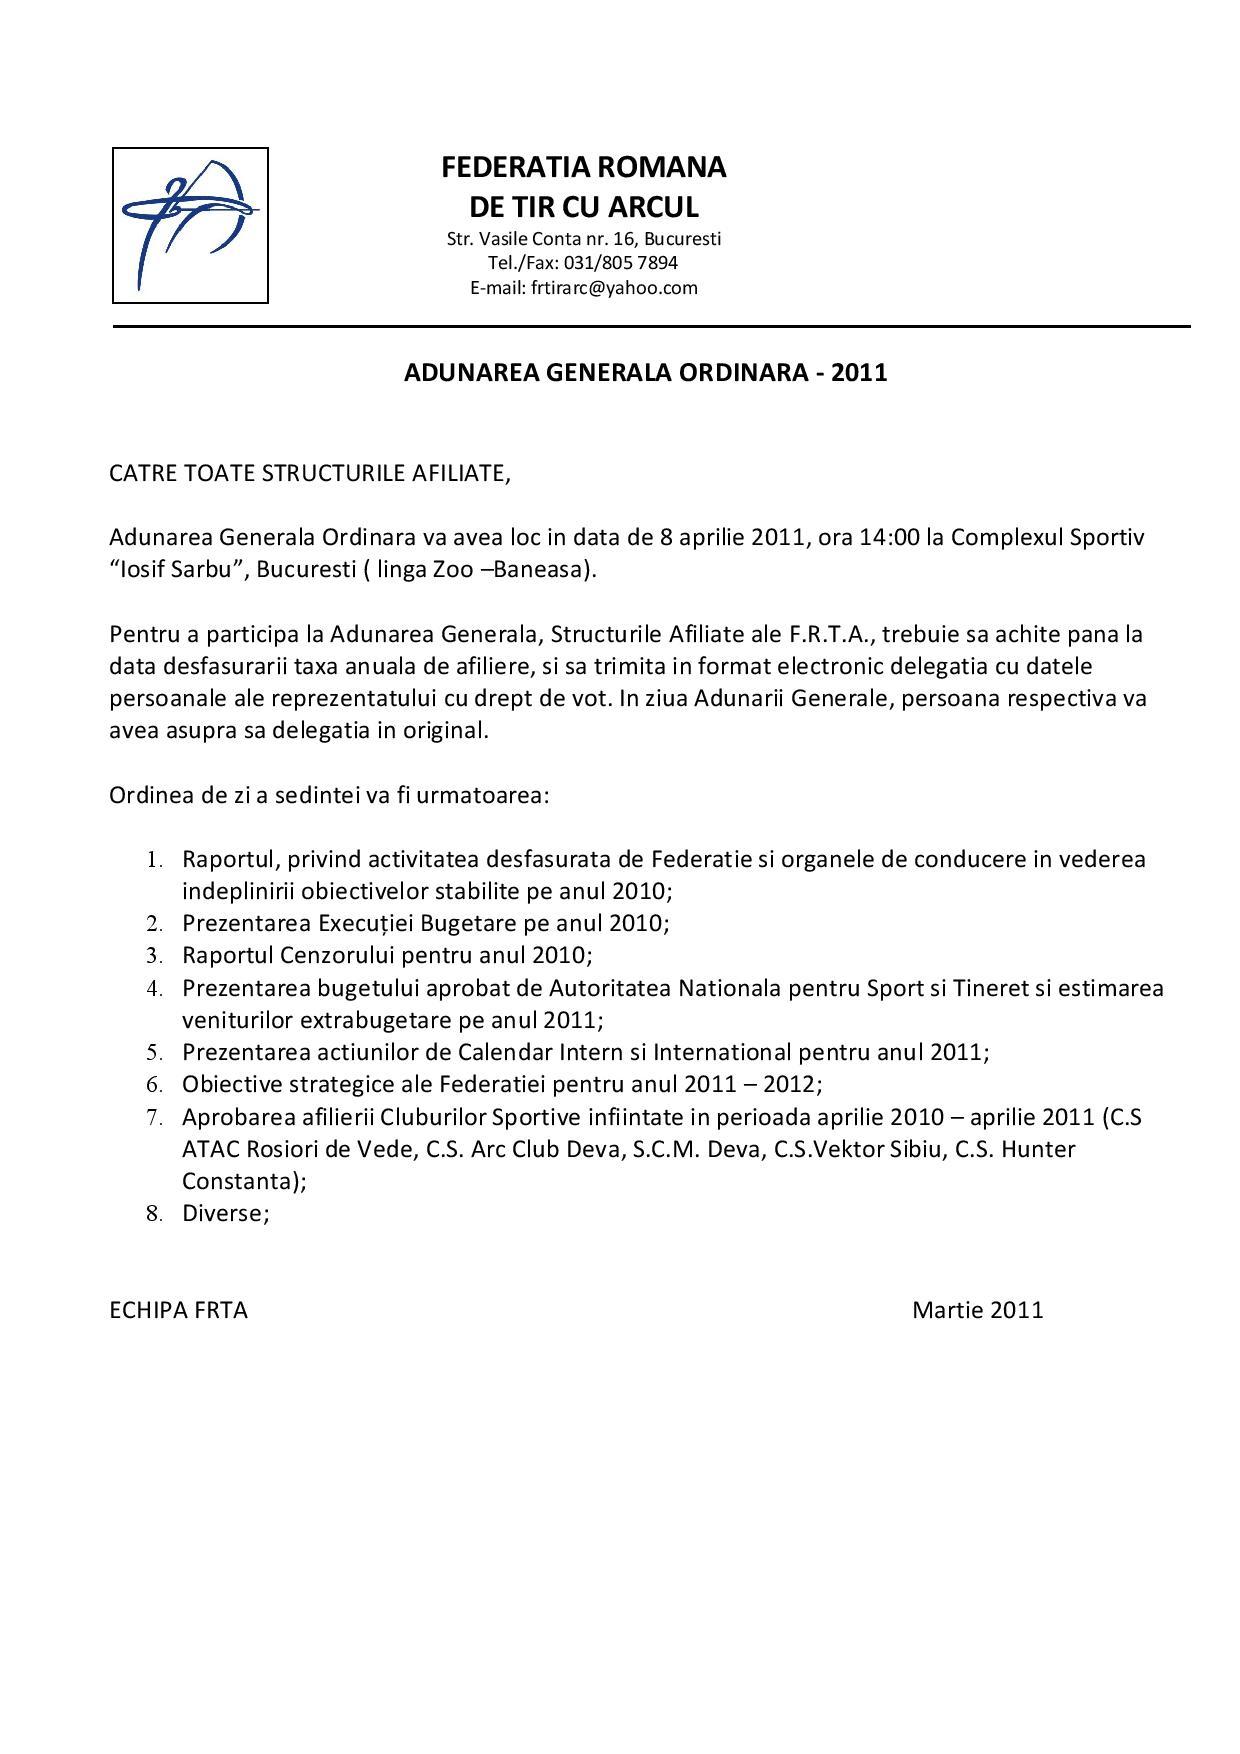 adunarea-generala-ordinara-page-001 (1)